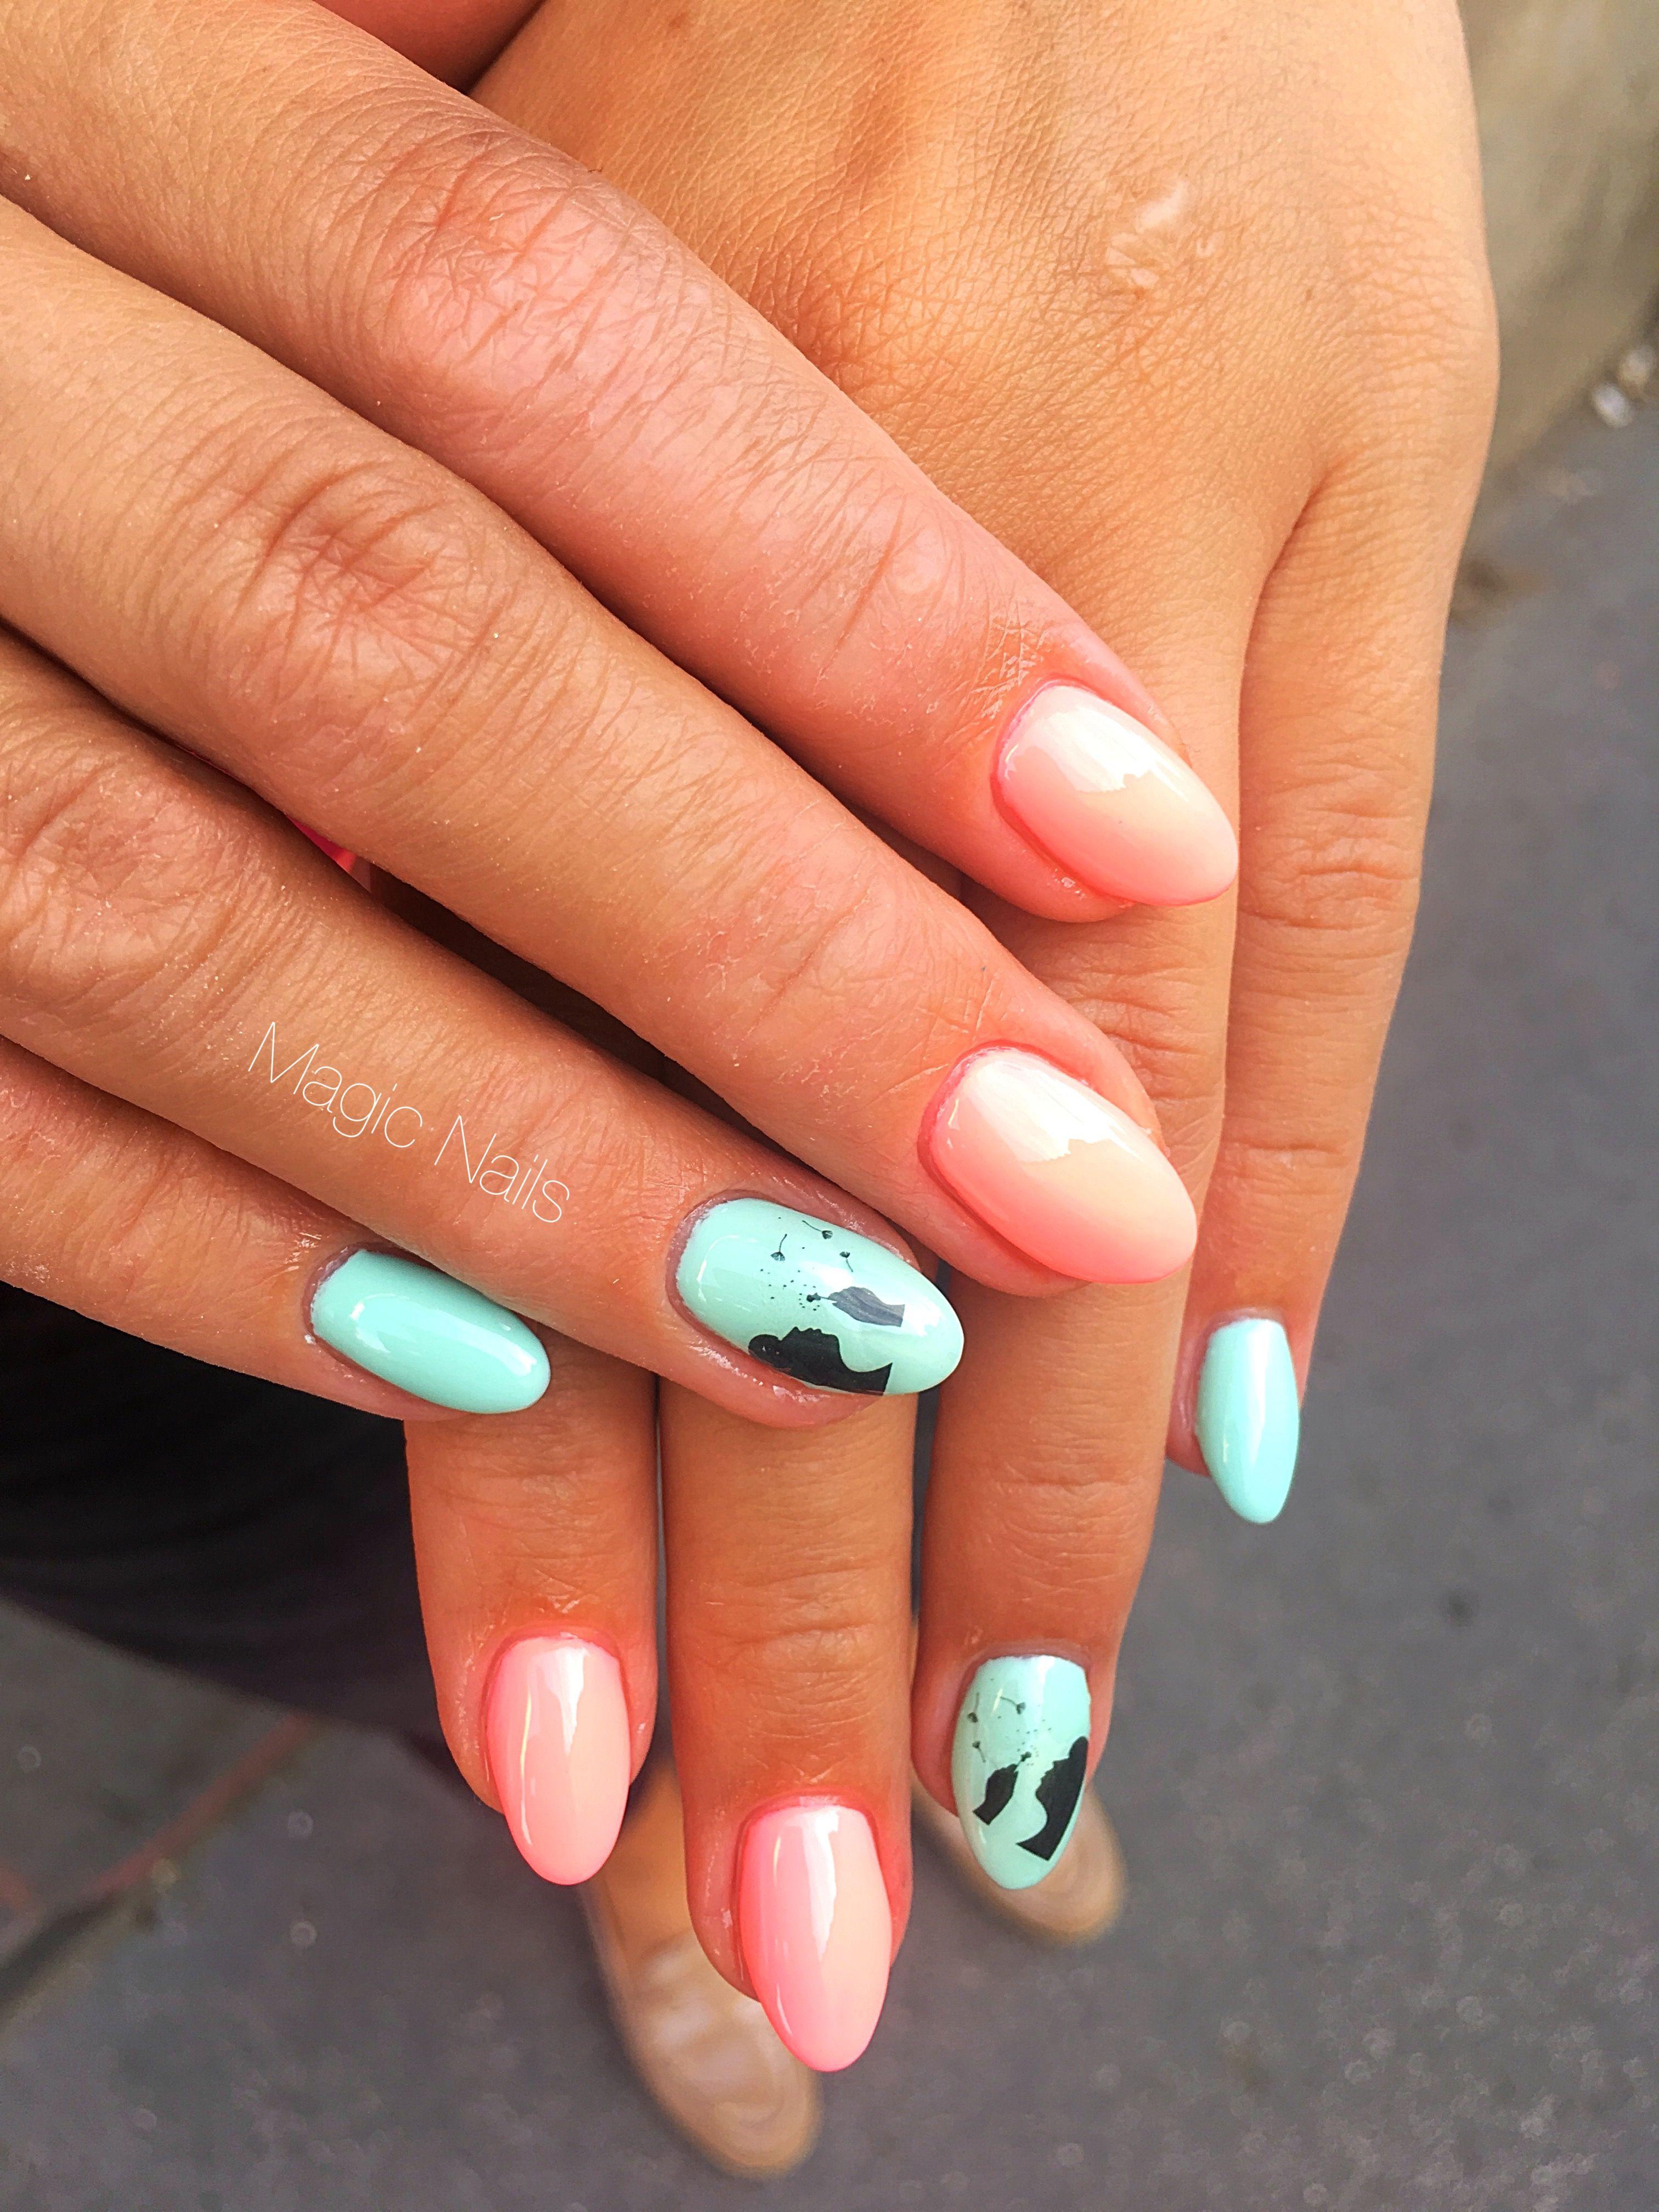 Pin by Kicsi Lány on Magic nails | Pinterest | Magic nails